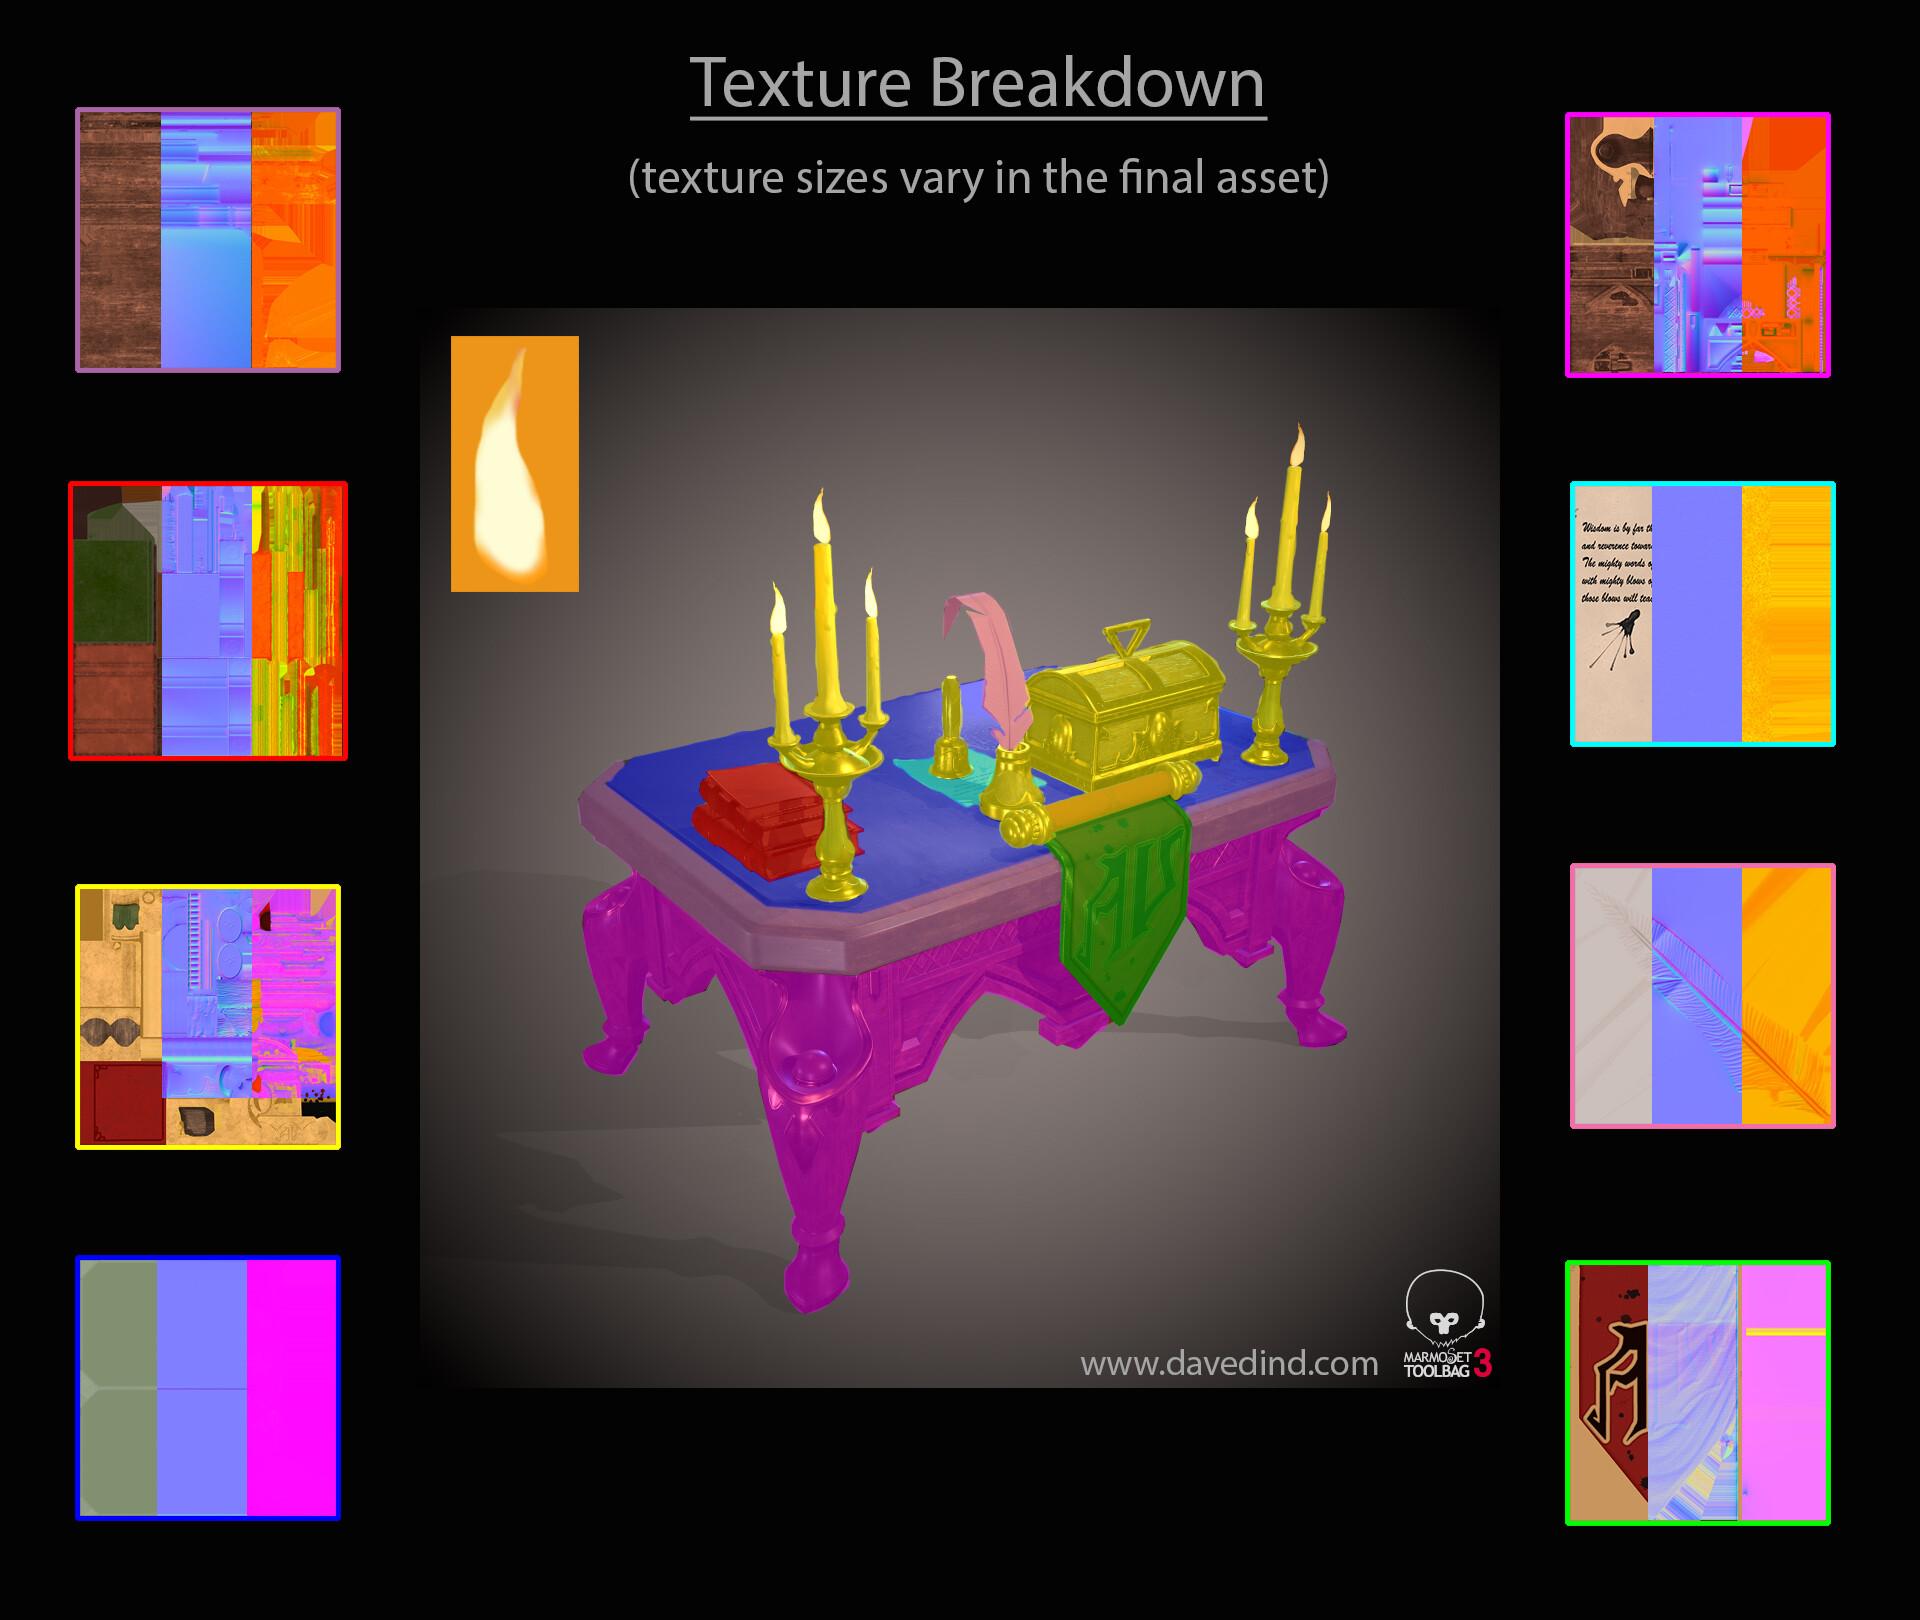 Dave dind texture breakdown web